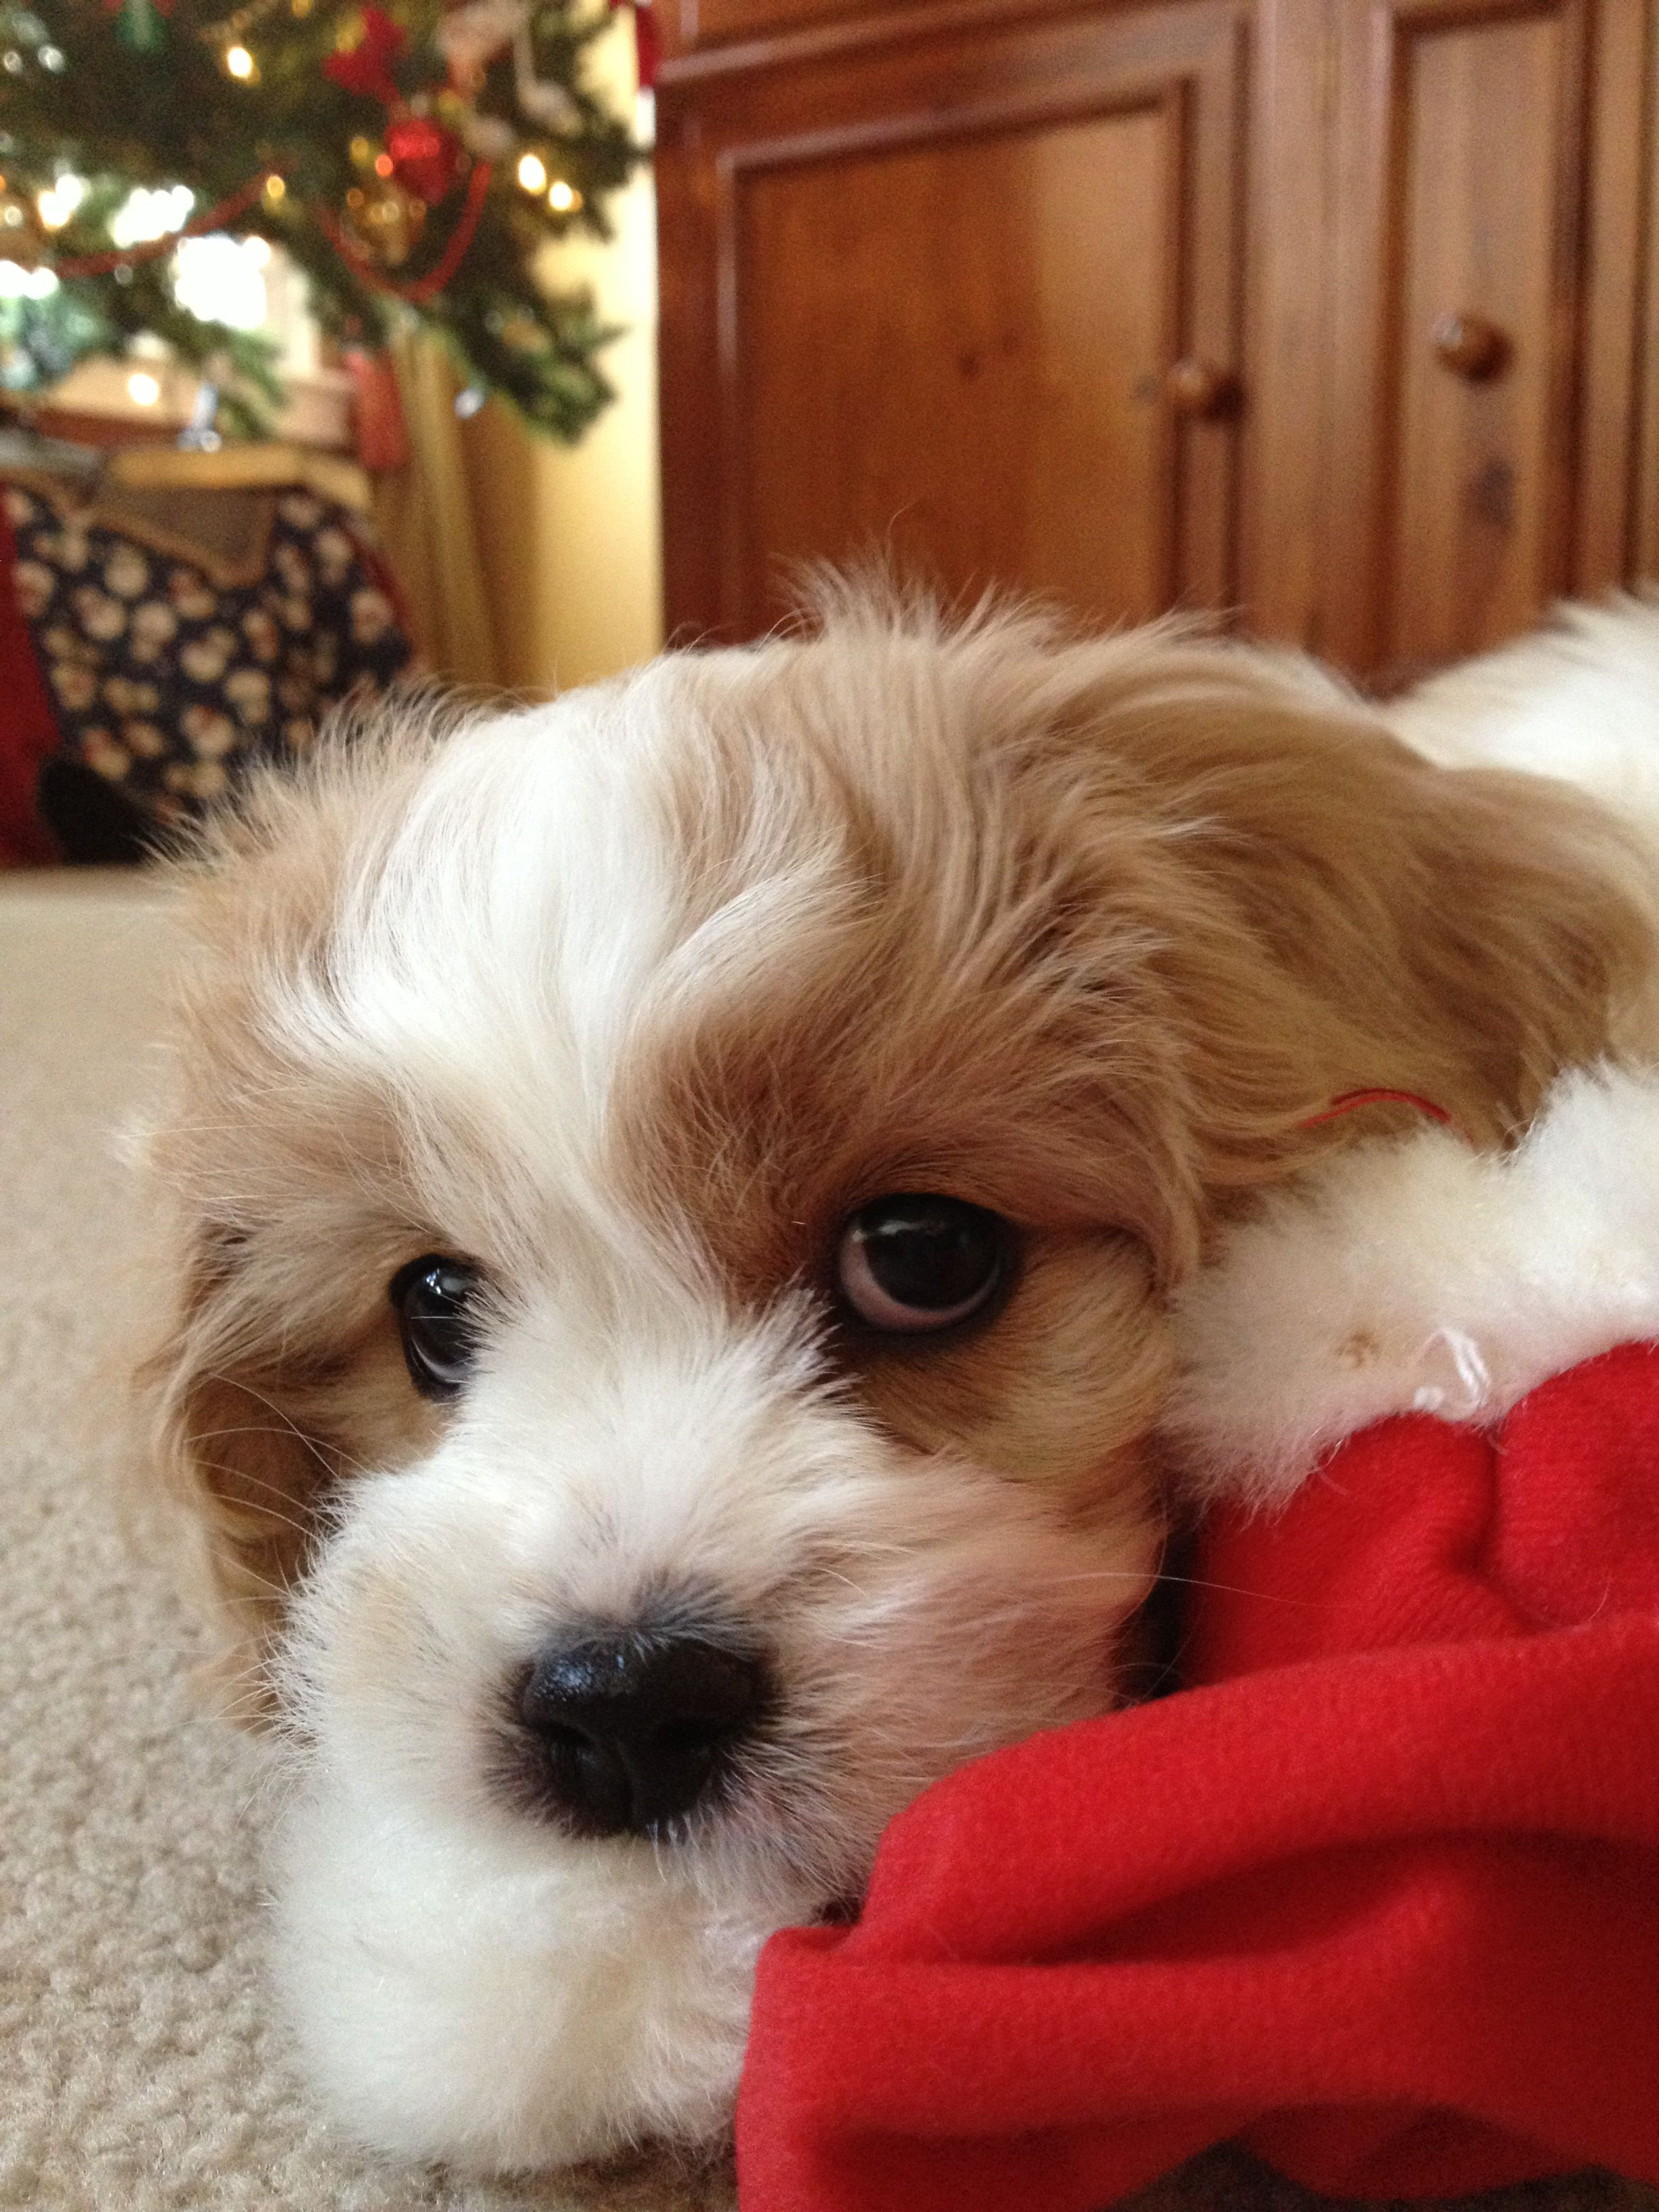 Cavachon Cavachon puppies, Cavachon, Cute dogs